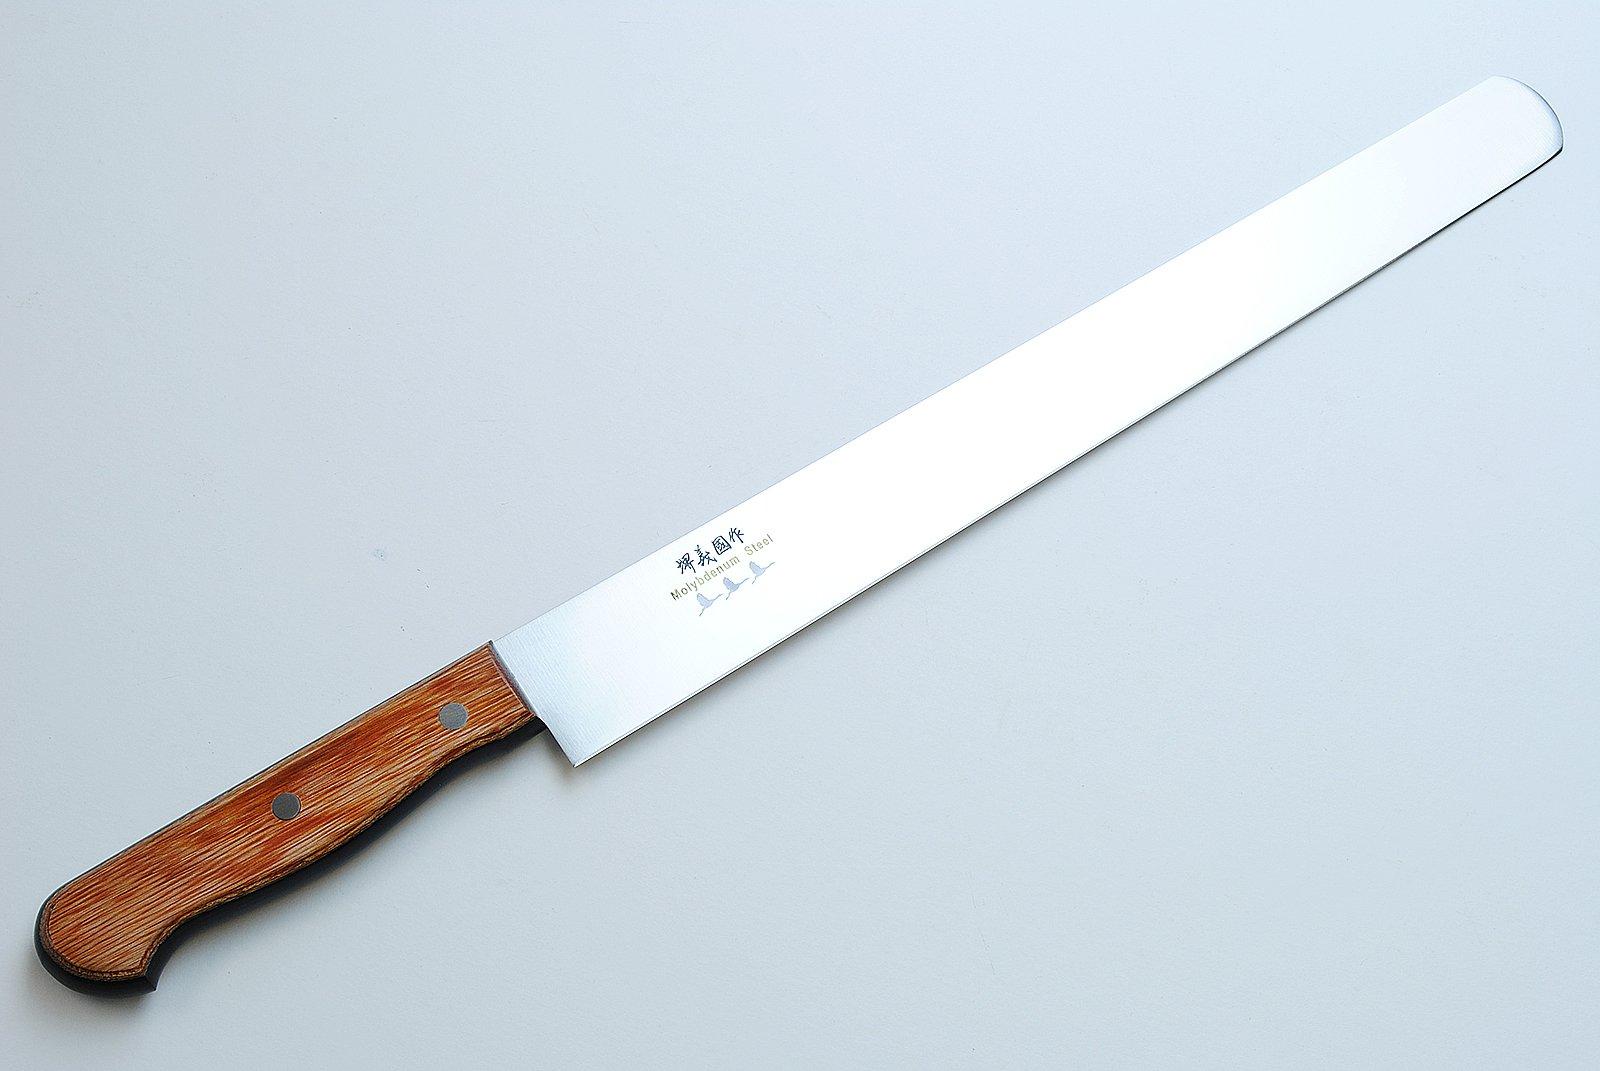 YOSHIHIRO VG-1 High Carbon Stainless Steel Japanese Pastry Knife 14.1-inch 360mm Yoshikuni Series